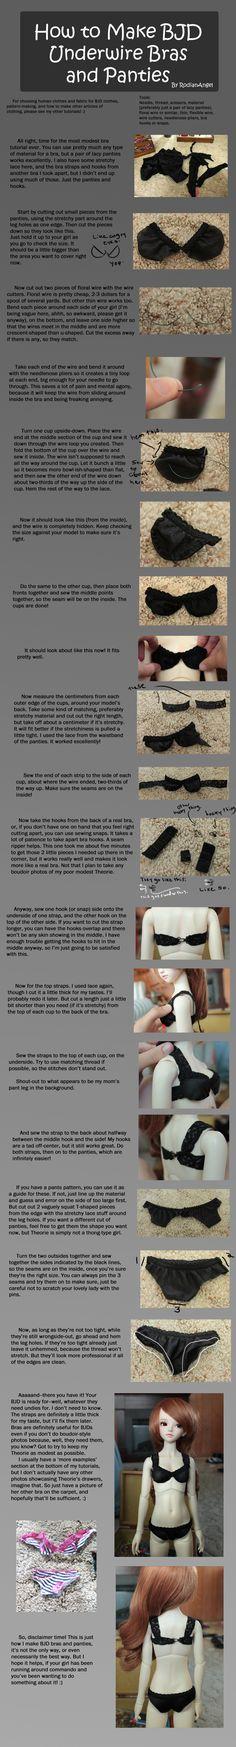 How to Make BJD Underwire Bras and Panties by RodianAngel.deviantart.com on @deviantART